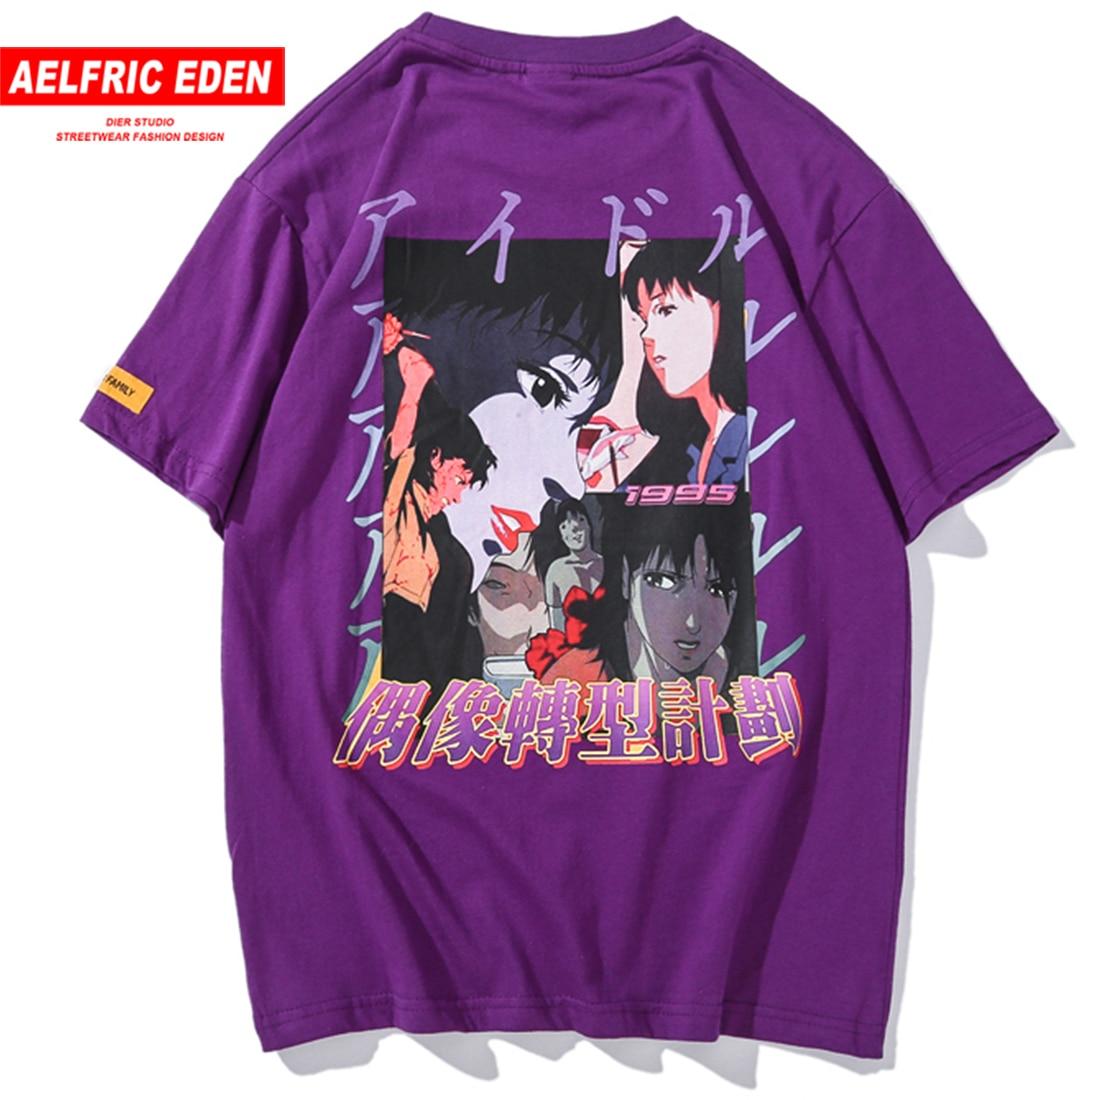 Aelfric Eden Anime 3d Print Fashion T-shirts Men 2019 Summer Short Sleeve Hip Hop Tops Tees Cotton Casual Streetwear Man Tshirt